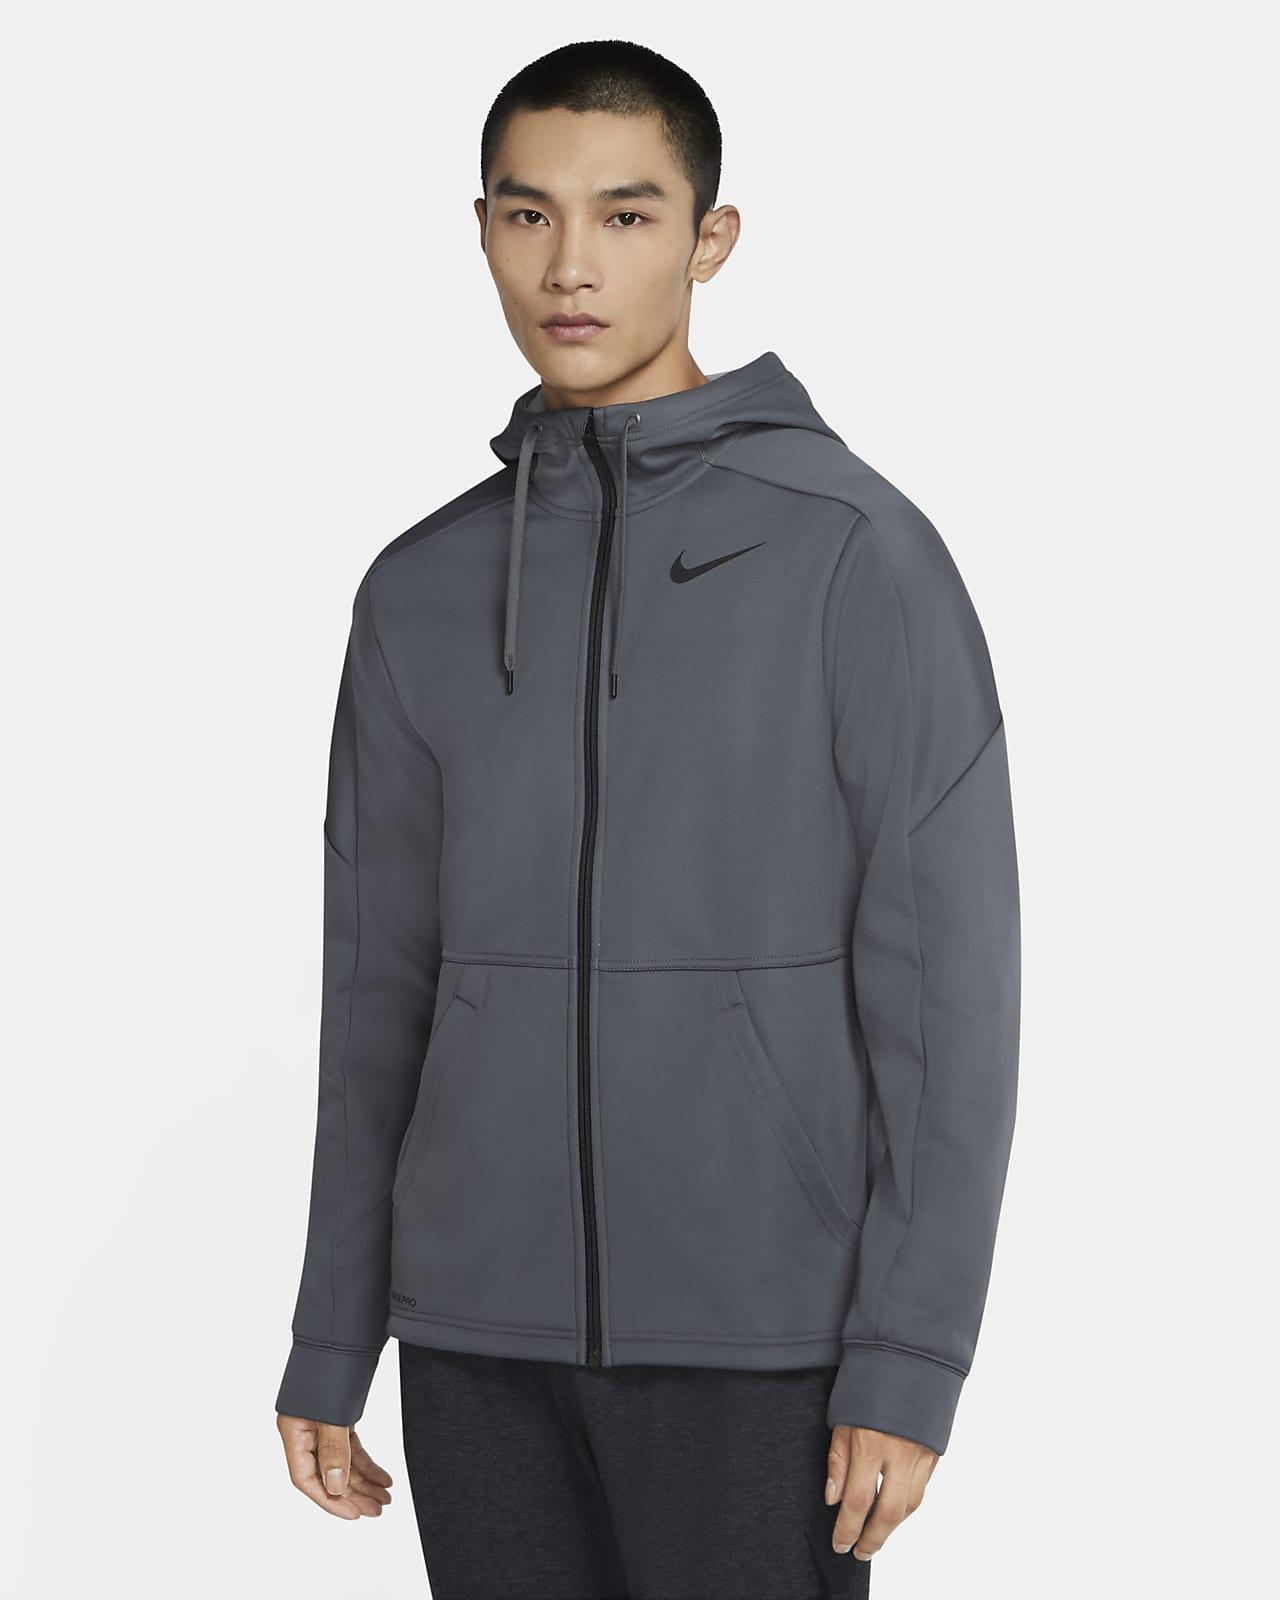 Nike Therma 男子全长拉链开襟训练连帽衫